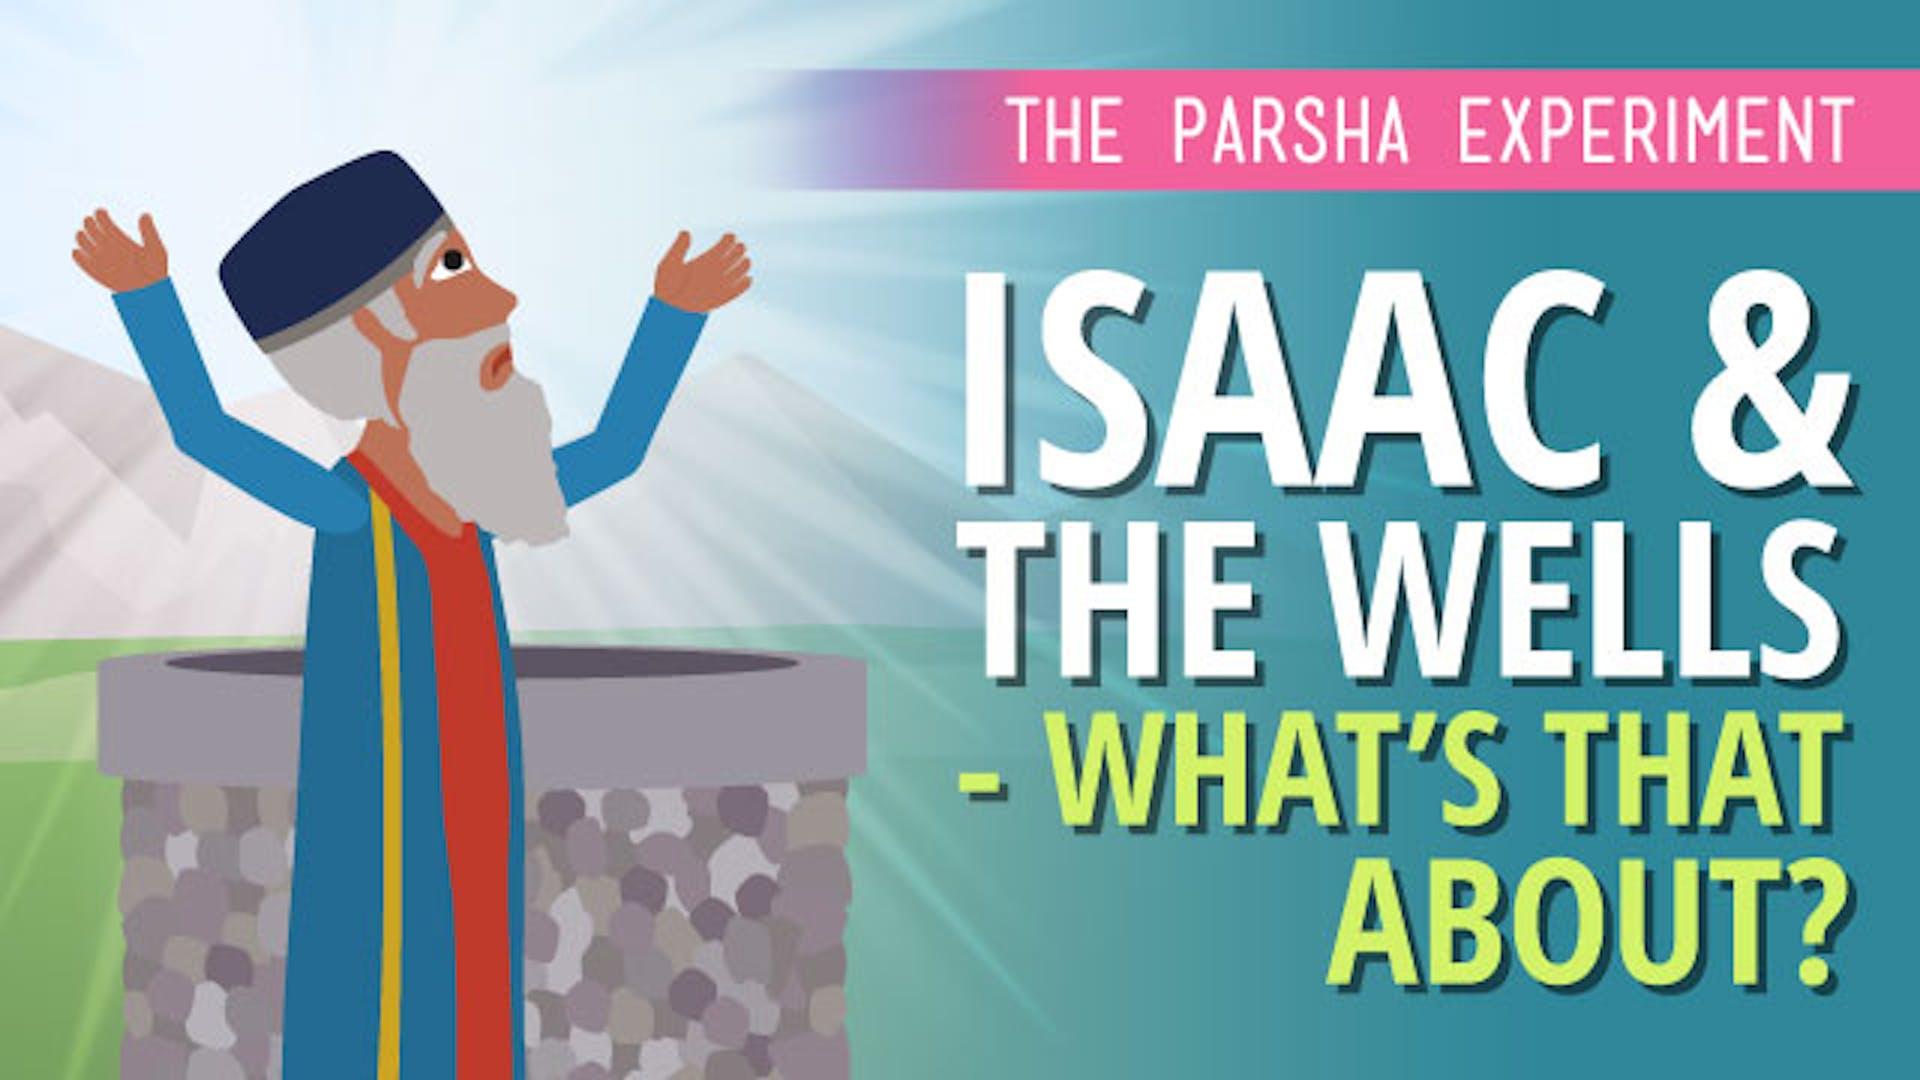 Isaac Abraham dig wells bible story